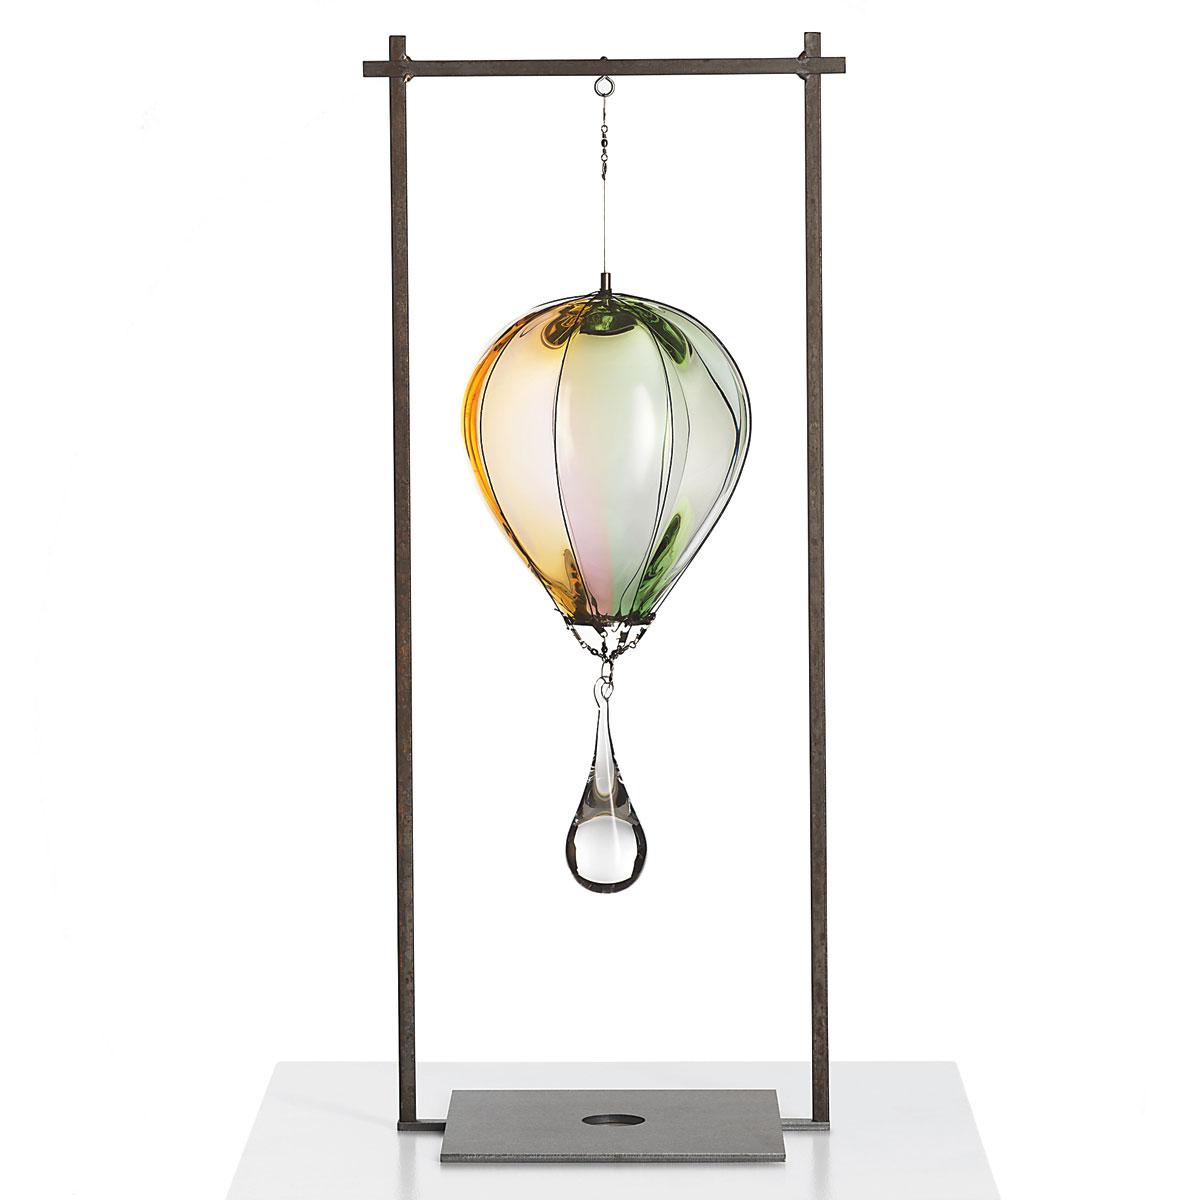 Kosta Boda Art Glass Kjell Engman Rainbow Limited Edition of 100